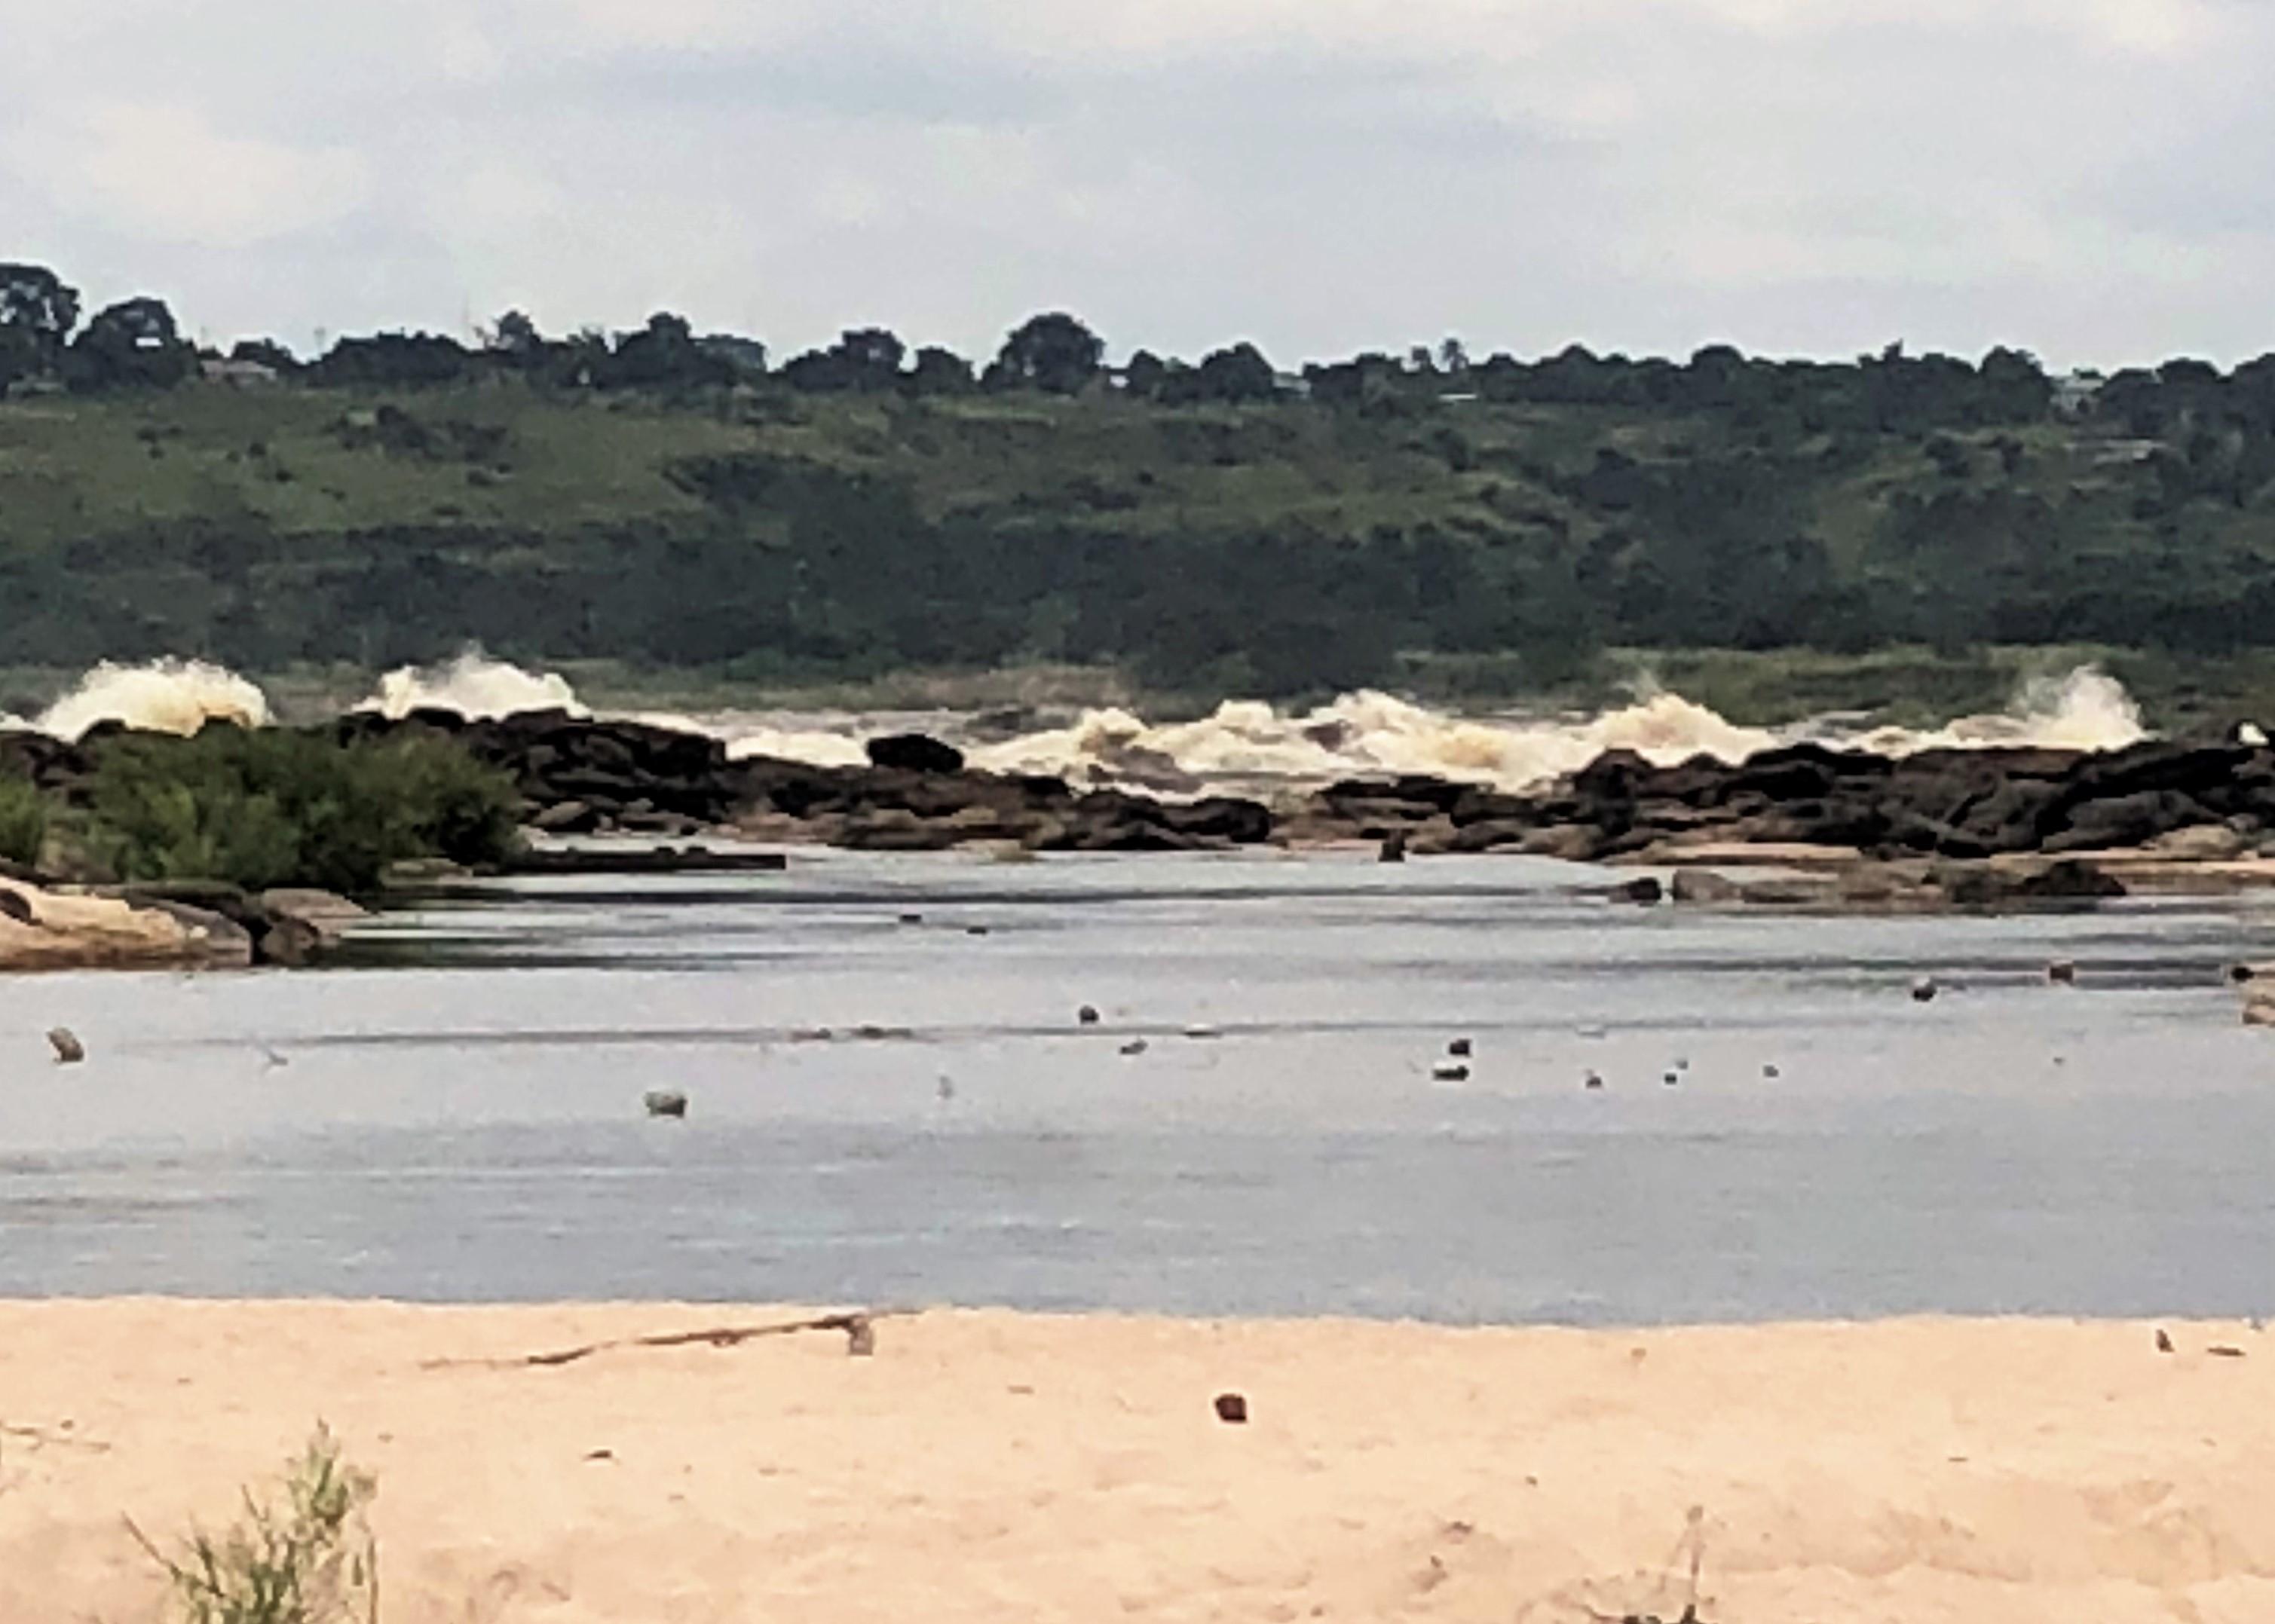 Congo rapids